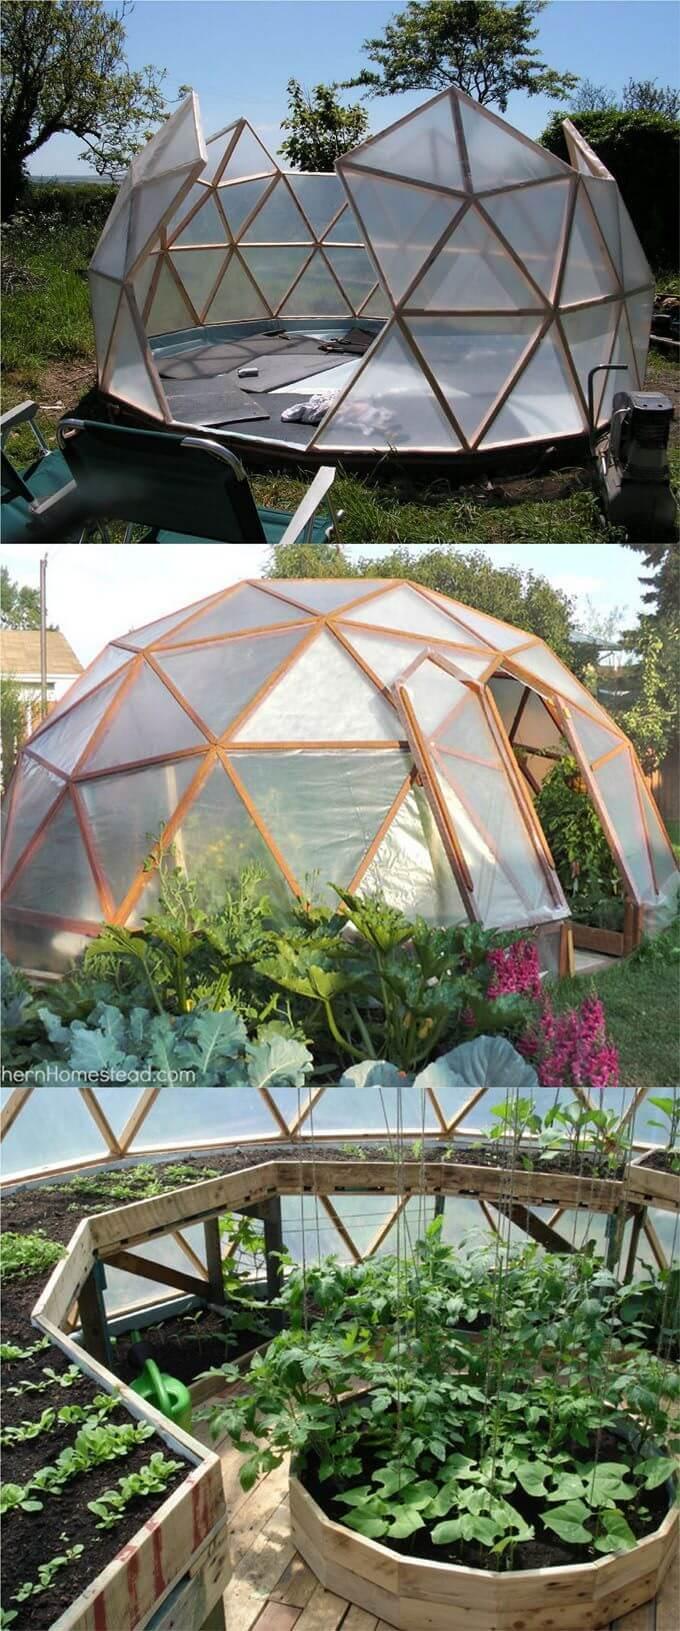 An Igloo-Inspired Walk-in Garden Green House